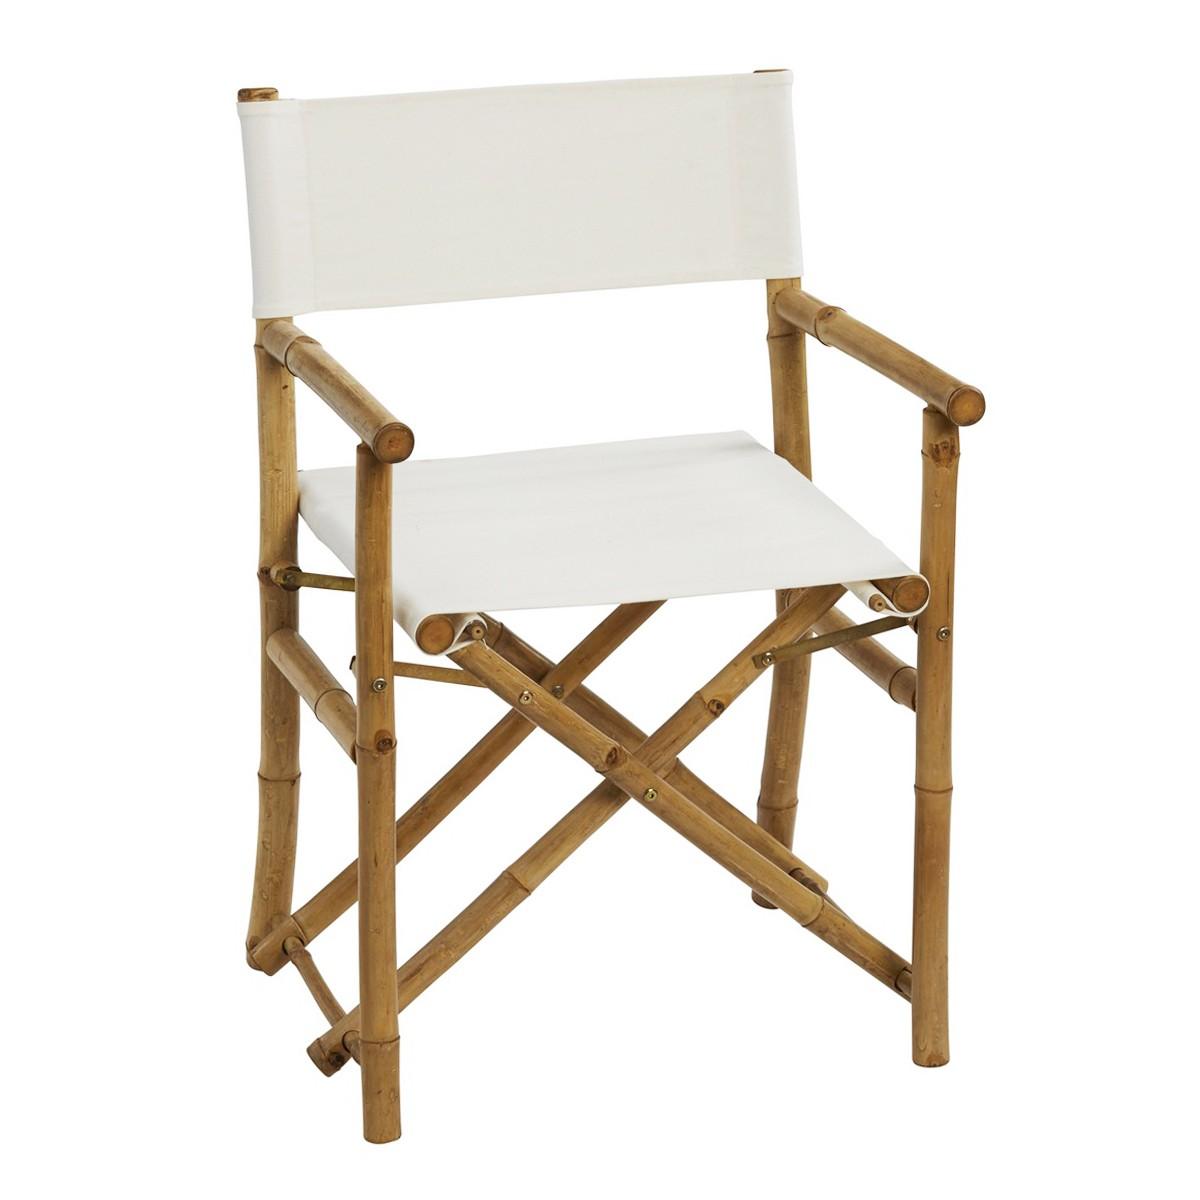 Sahnish Bamboo & Cotton Fabric Armchair, Ivory / Natural